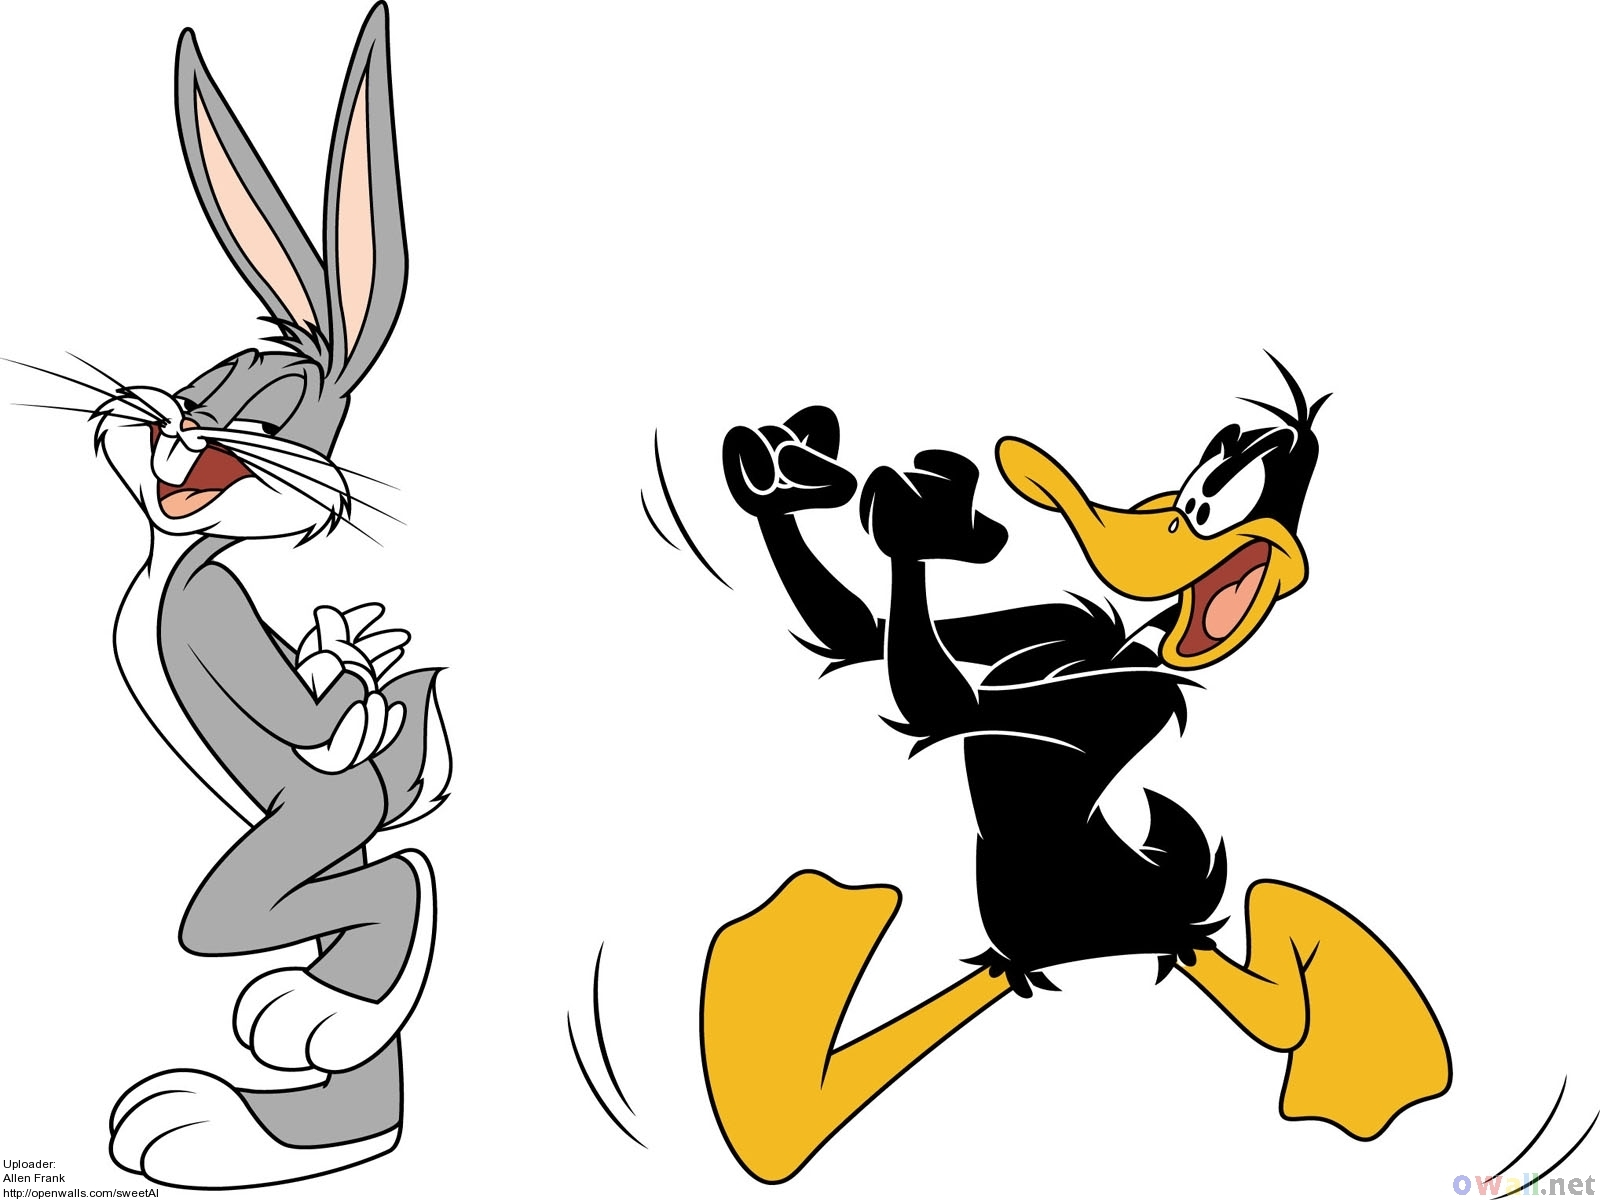 Funny Bugs Bunny Cartoon 3 Background